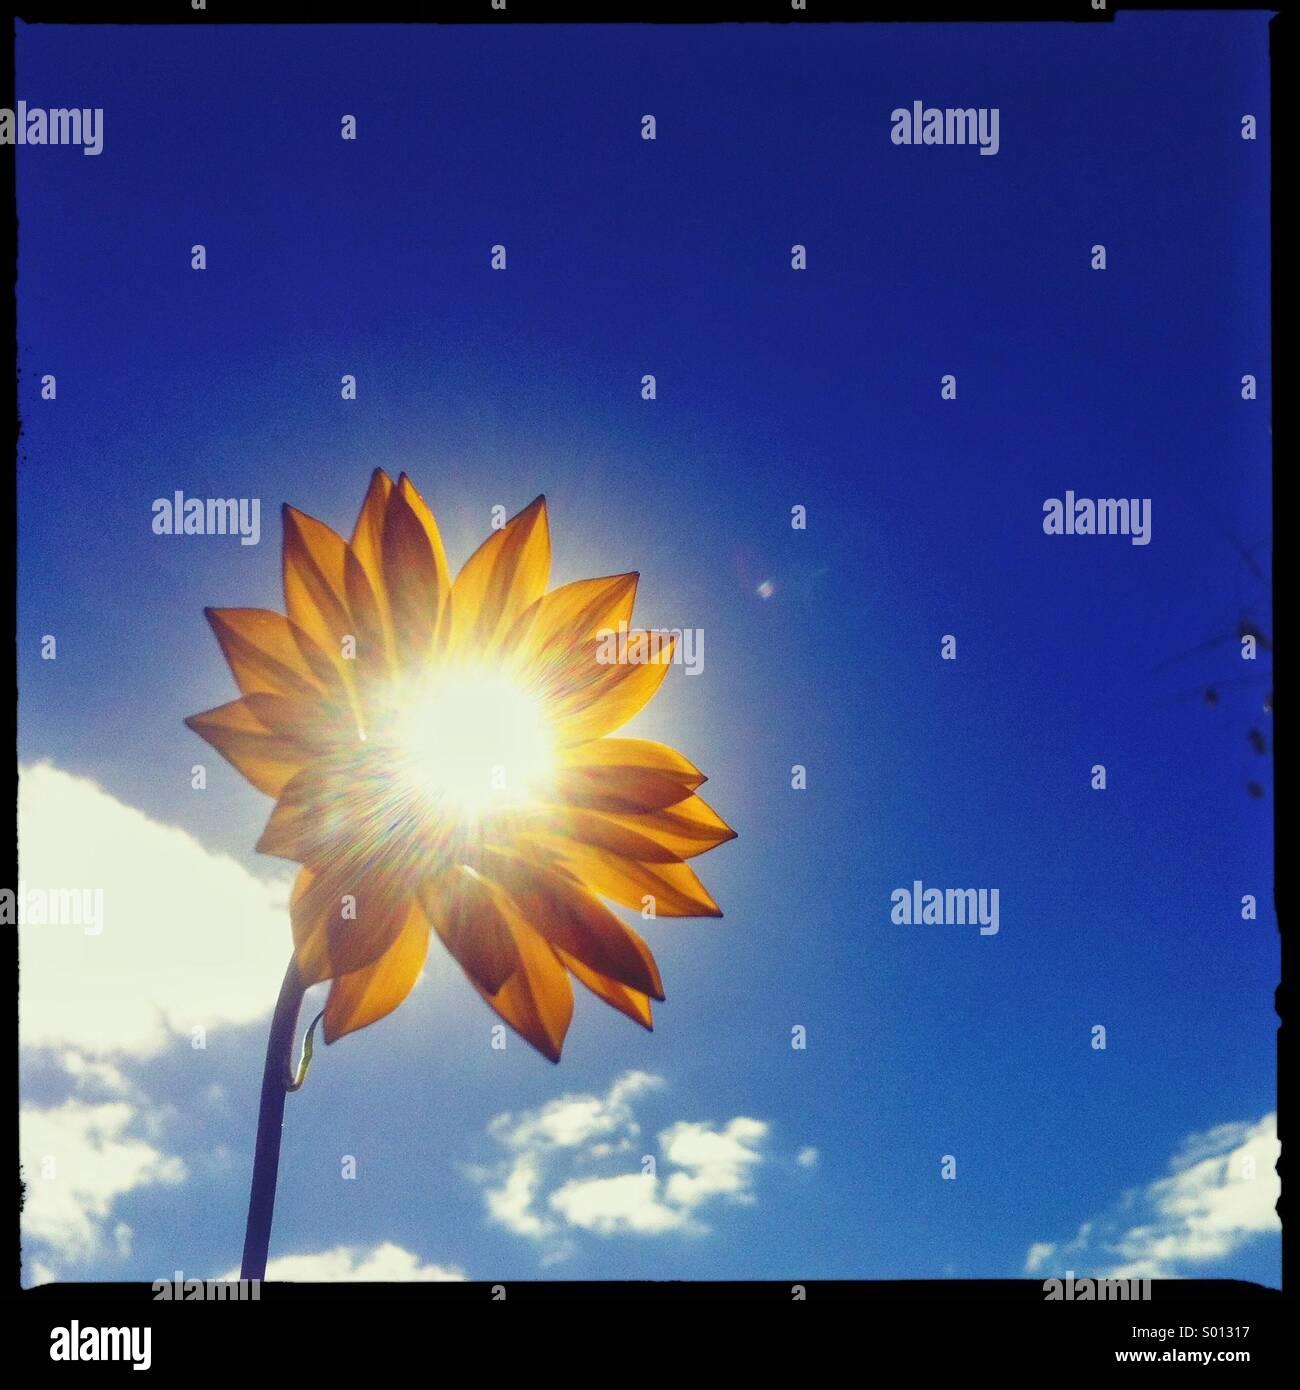 Sun shining through a flower - Stock Image